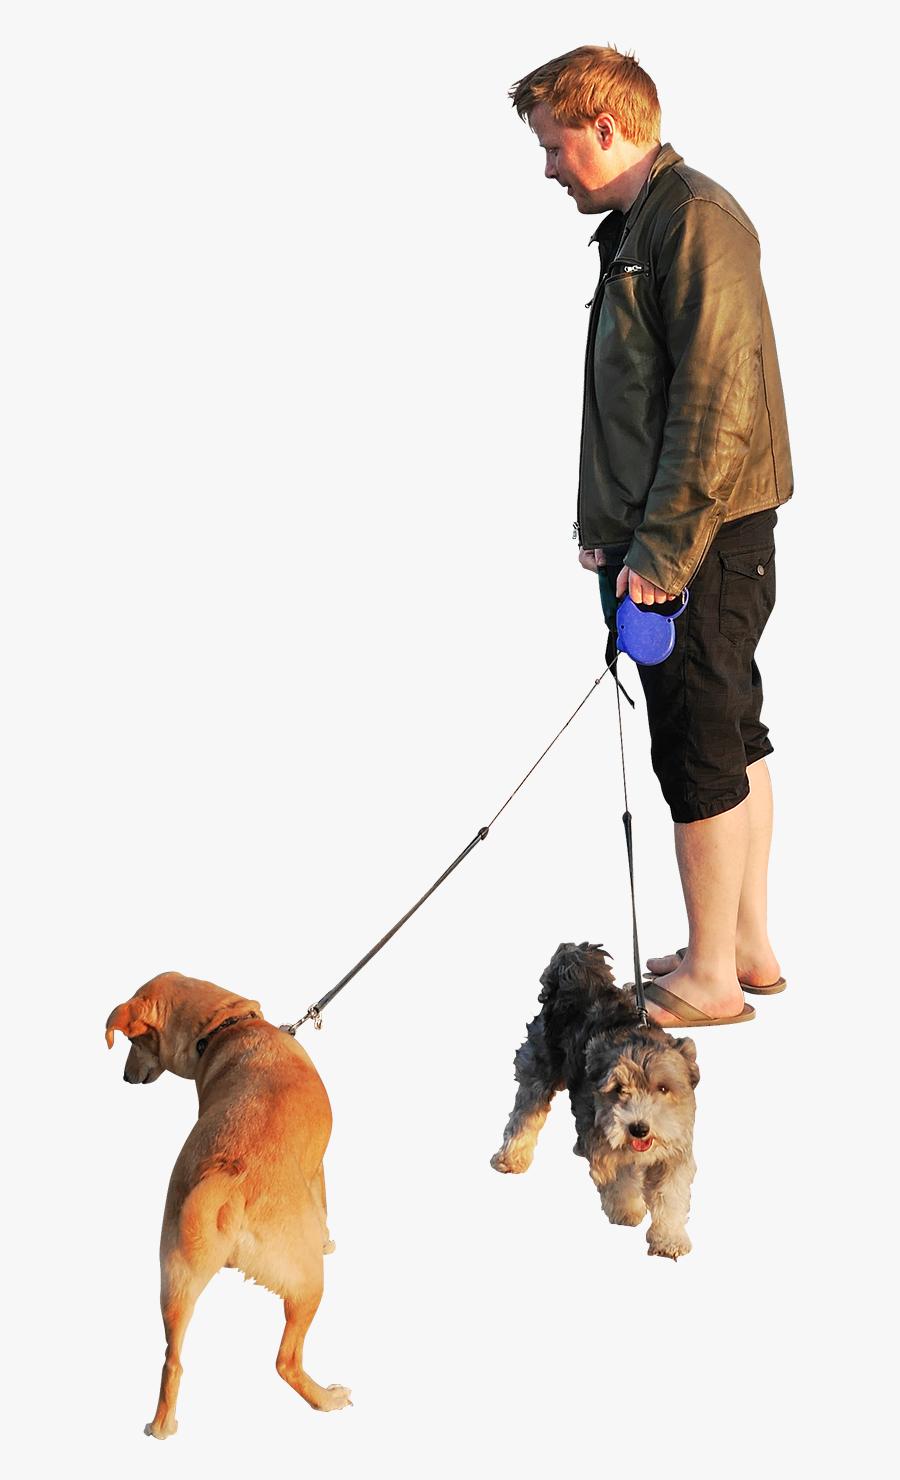 People Walking Dog Png - Person Walking Dog Transparent Background, Transparent Clipart